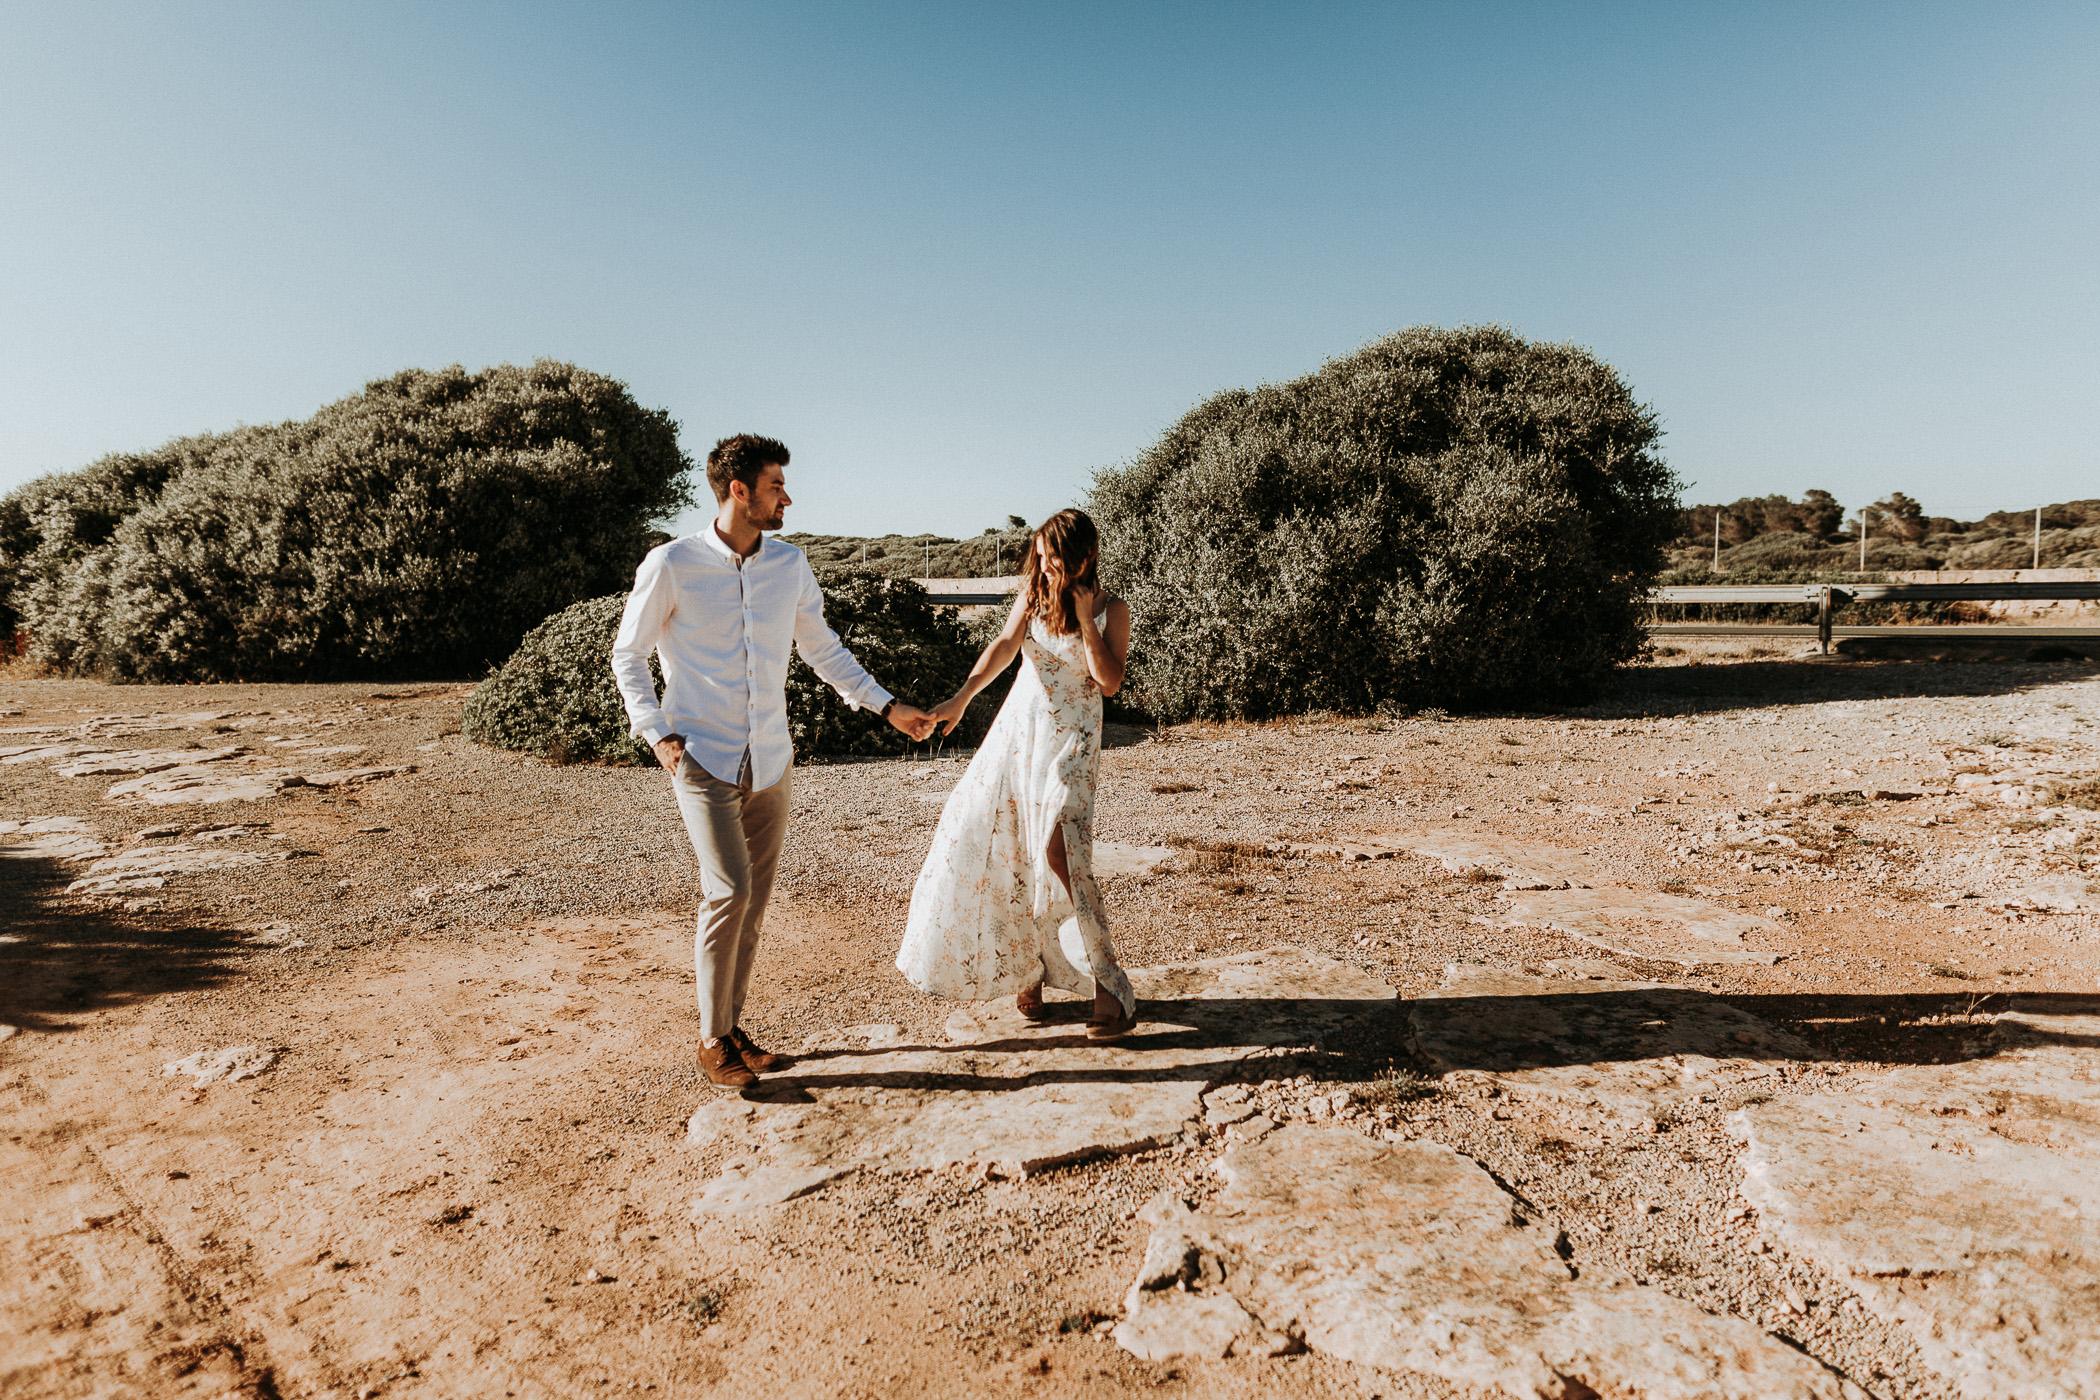 DanielaMarquardtPhotography_wedding_elopement_mallorca_spain_calapi_palma_lauraandtoni_156